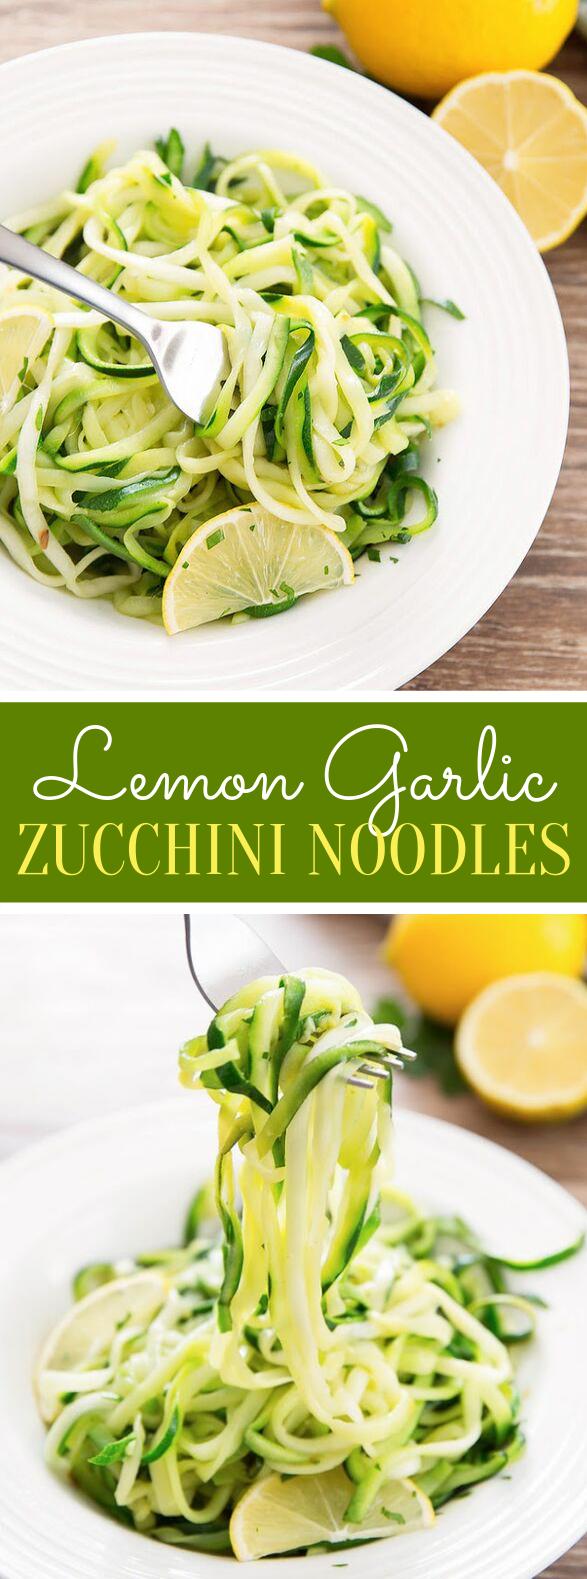 LEMON GARLIC ZUCCHINI NOODLES #vegetarian #veggies